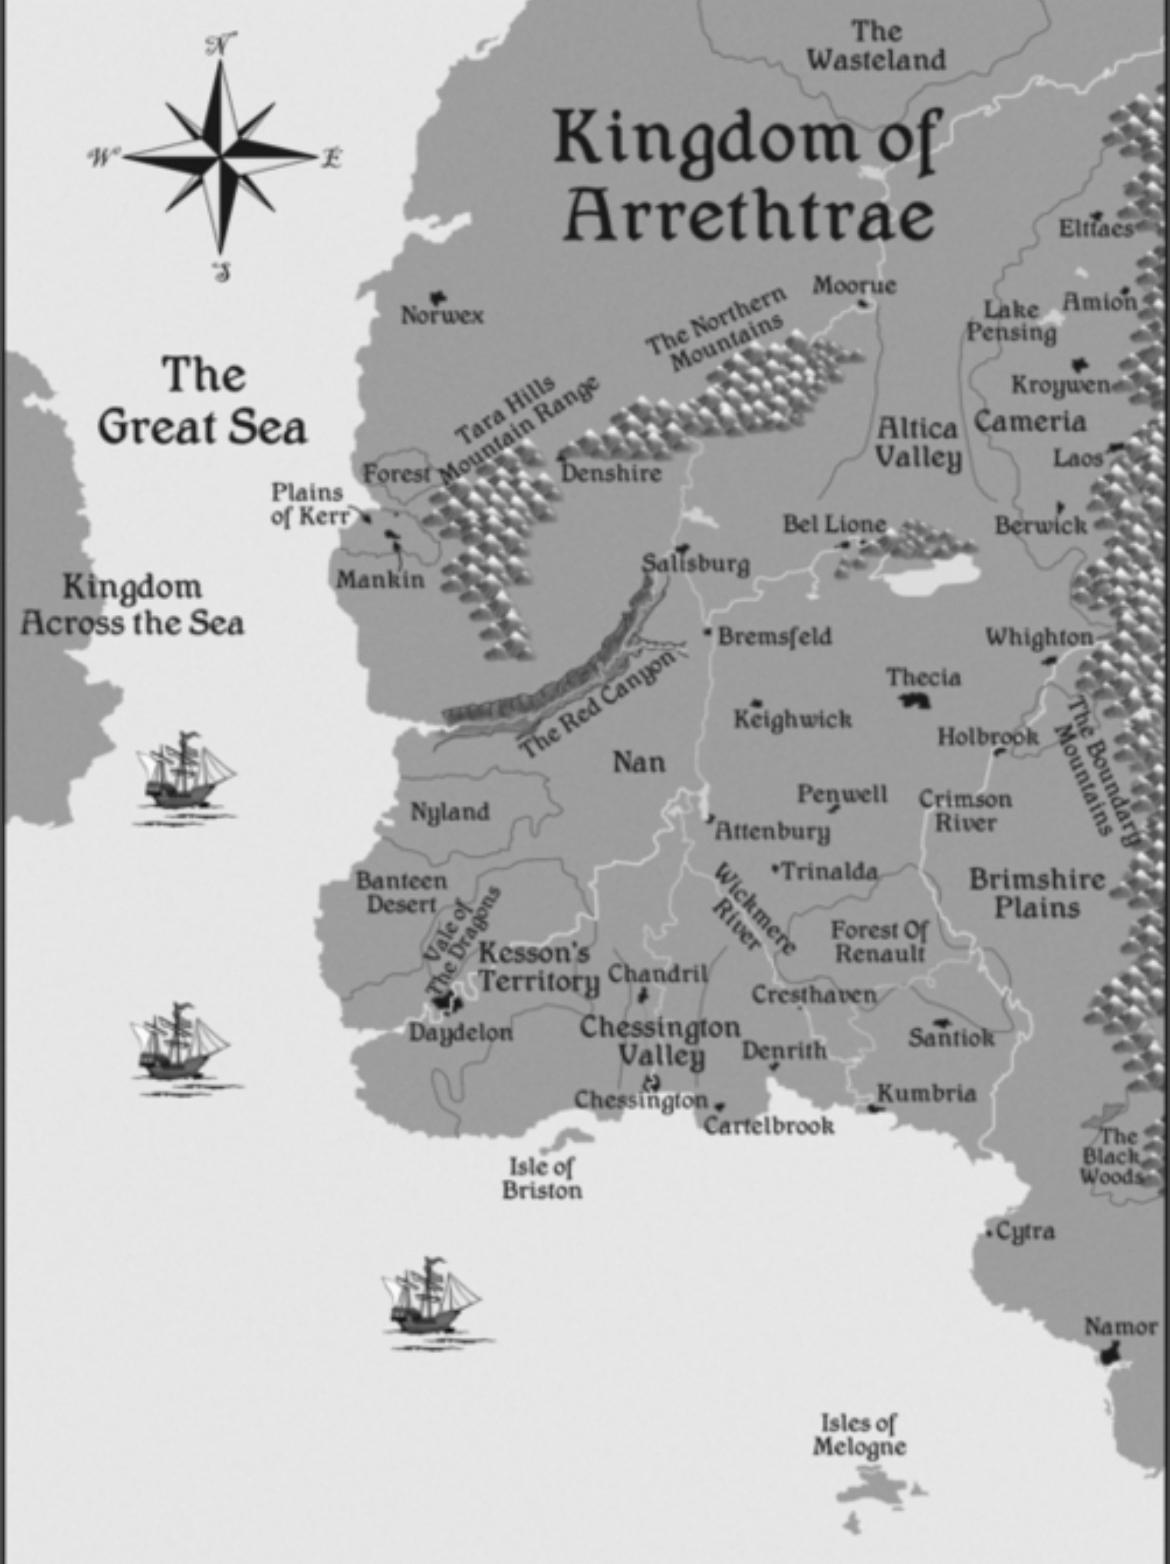 Map of Arrethtrae Chessington